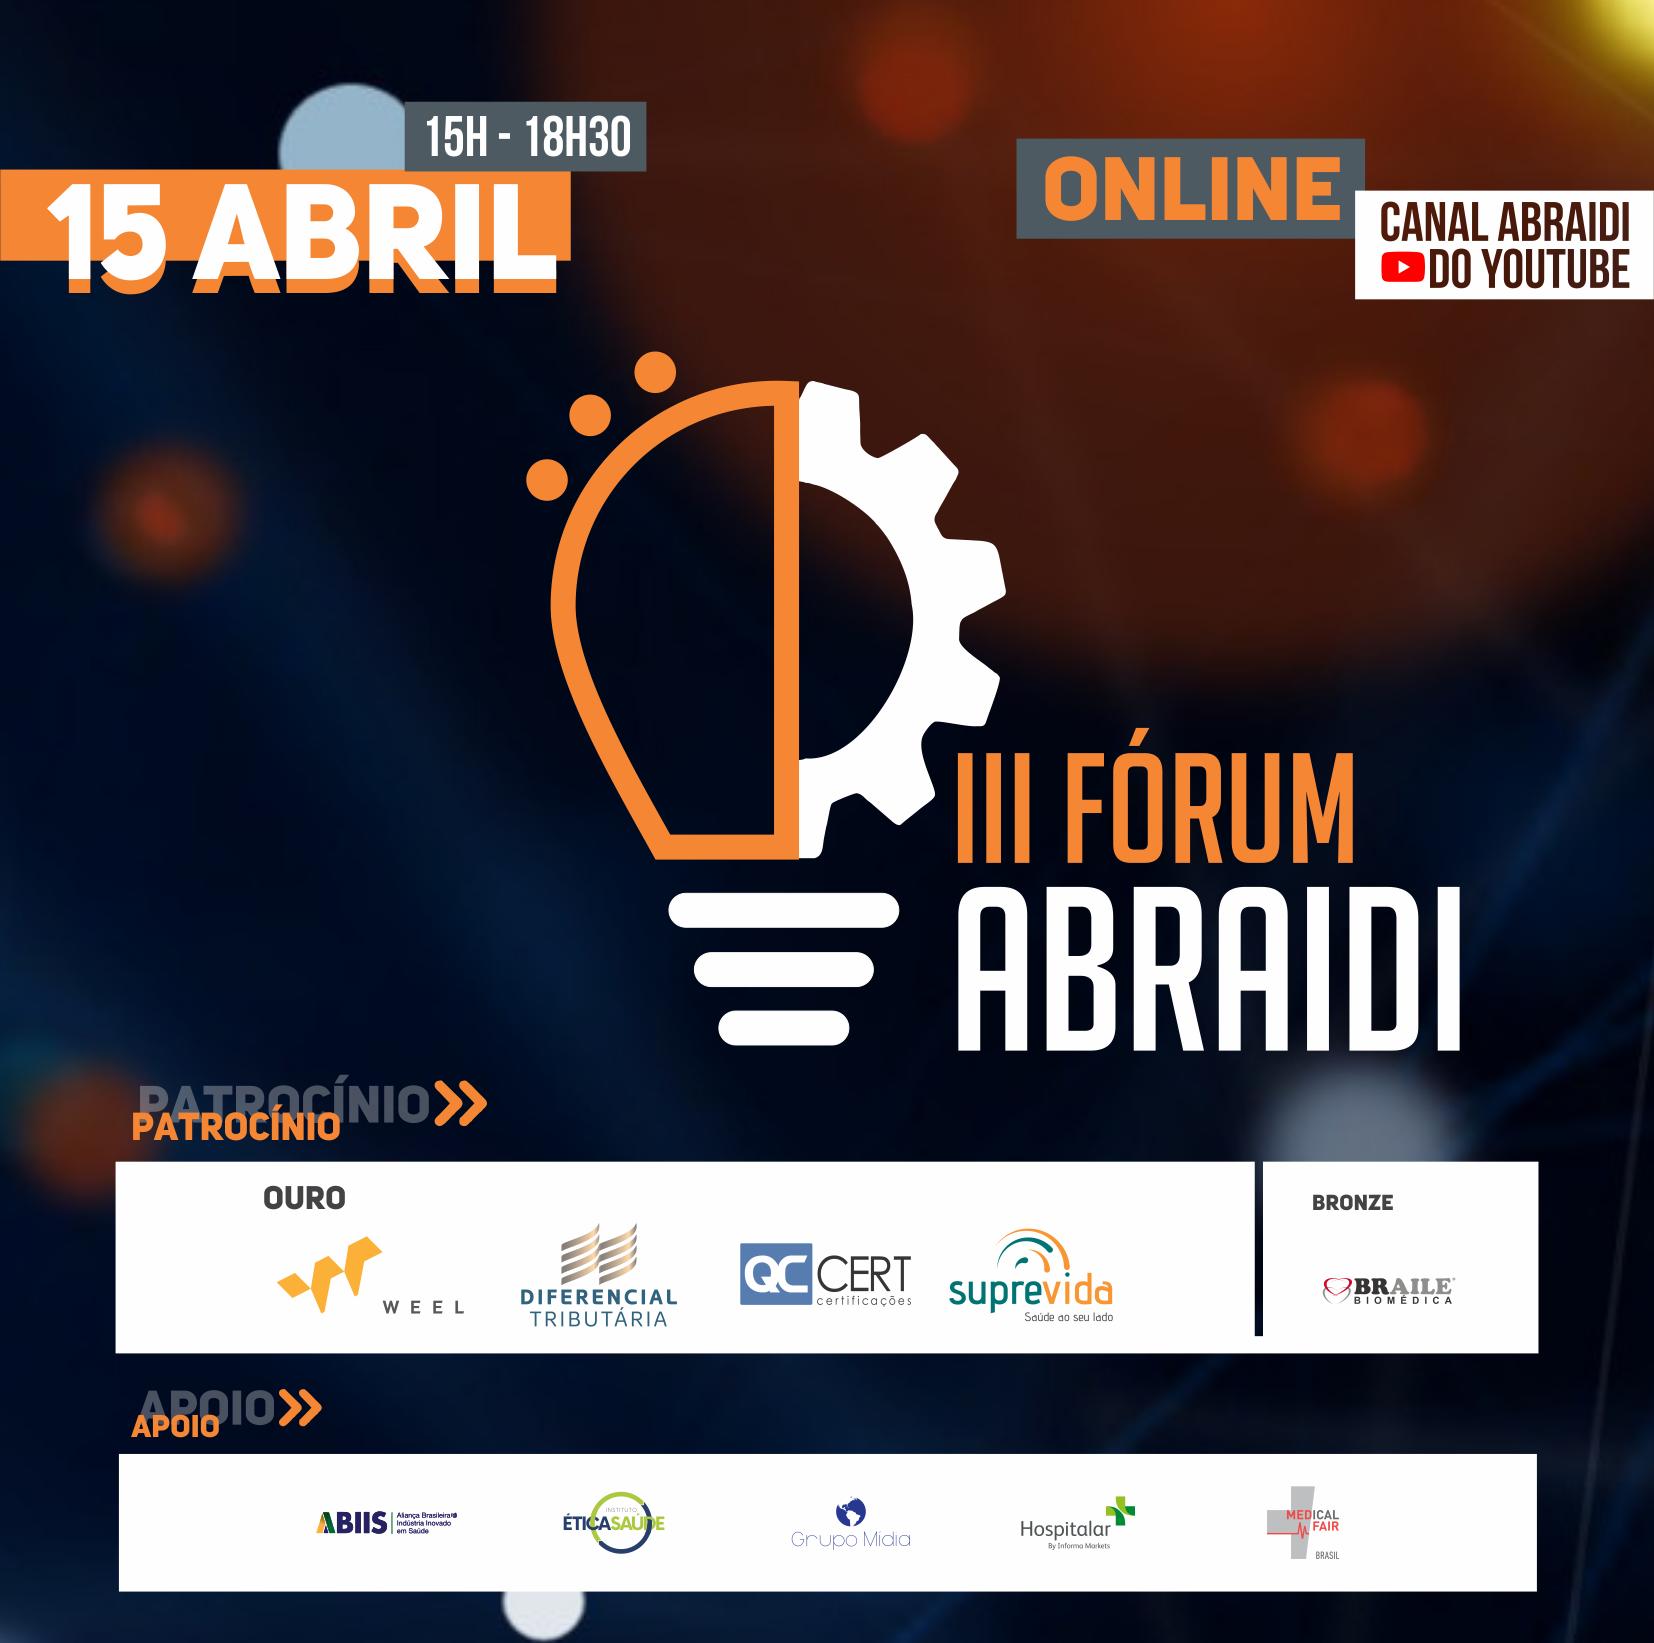 III Fórum ABRAIDI discute o impacto da pandemia e as perspectivas futuras no setor da saúde